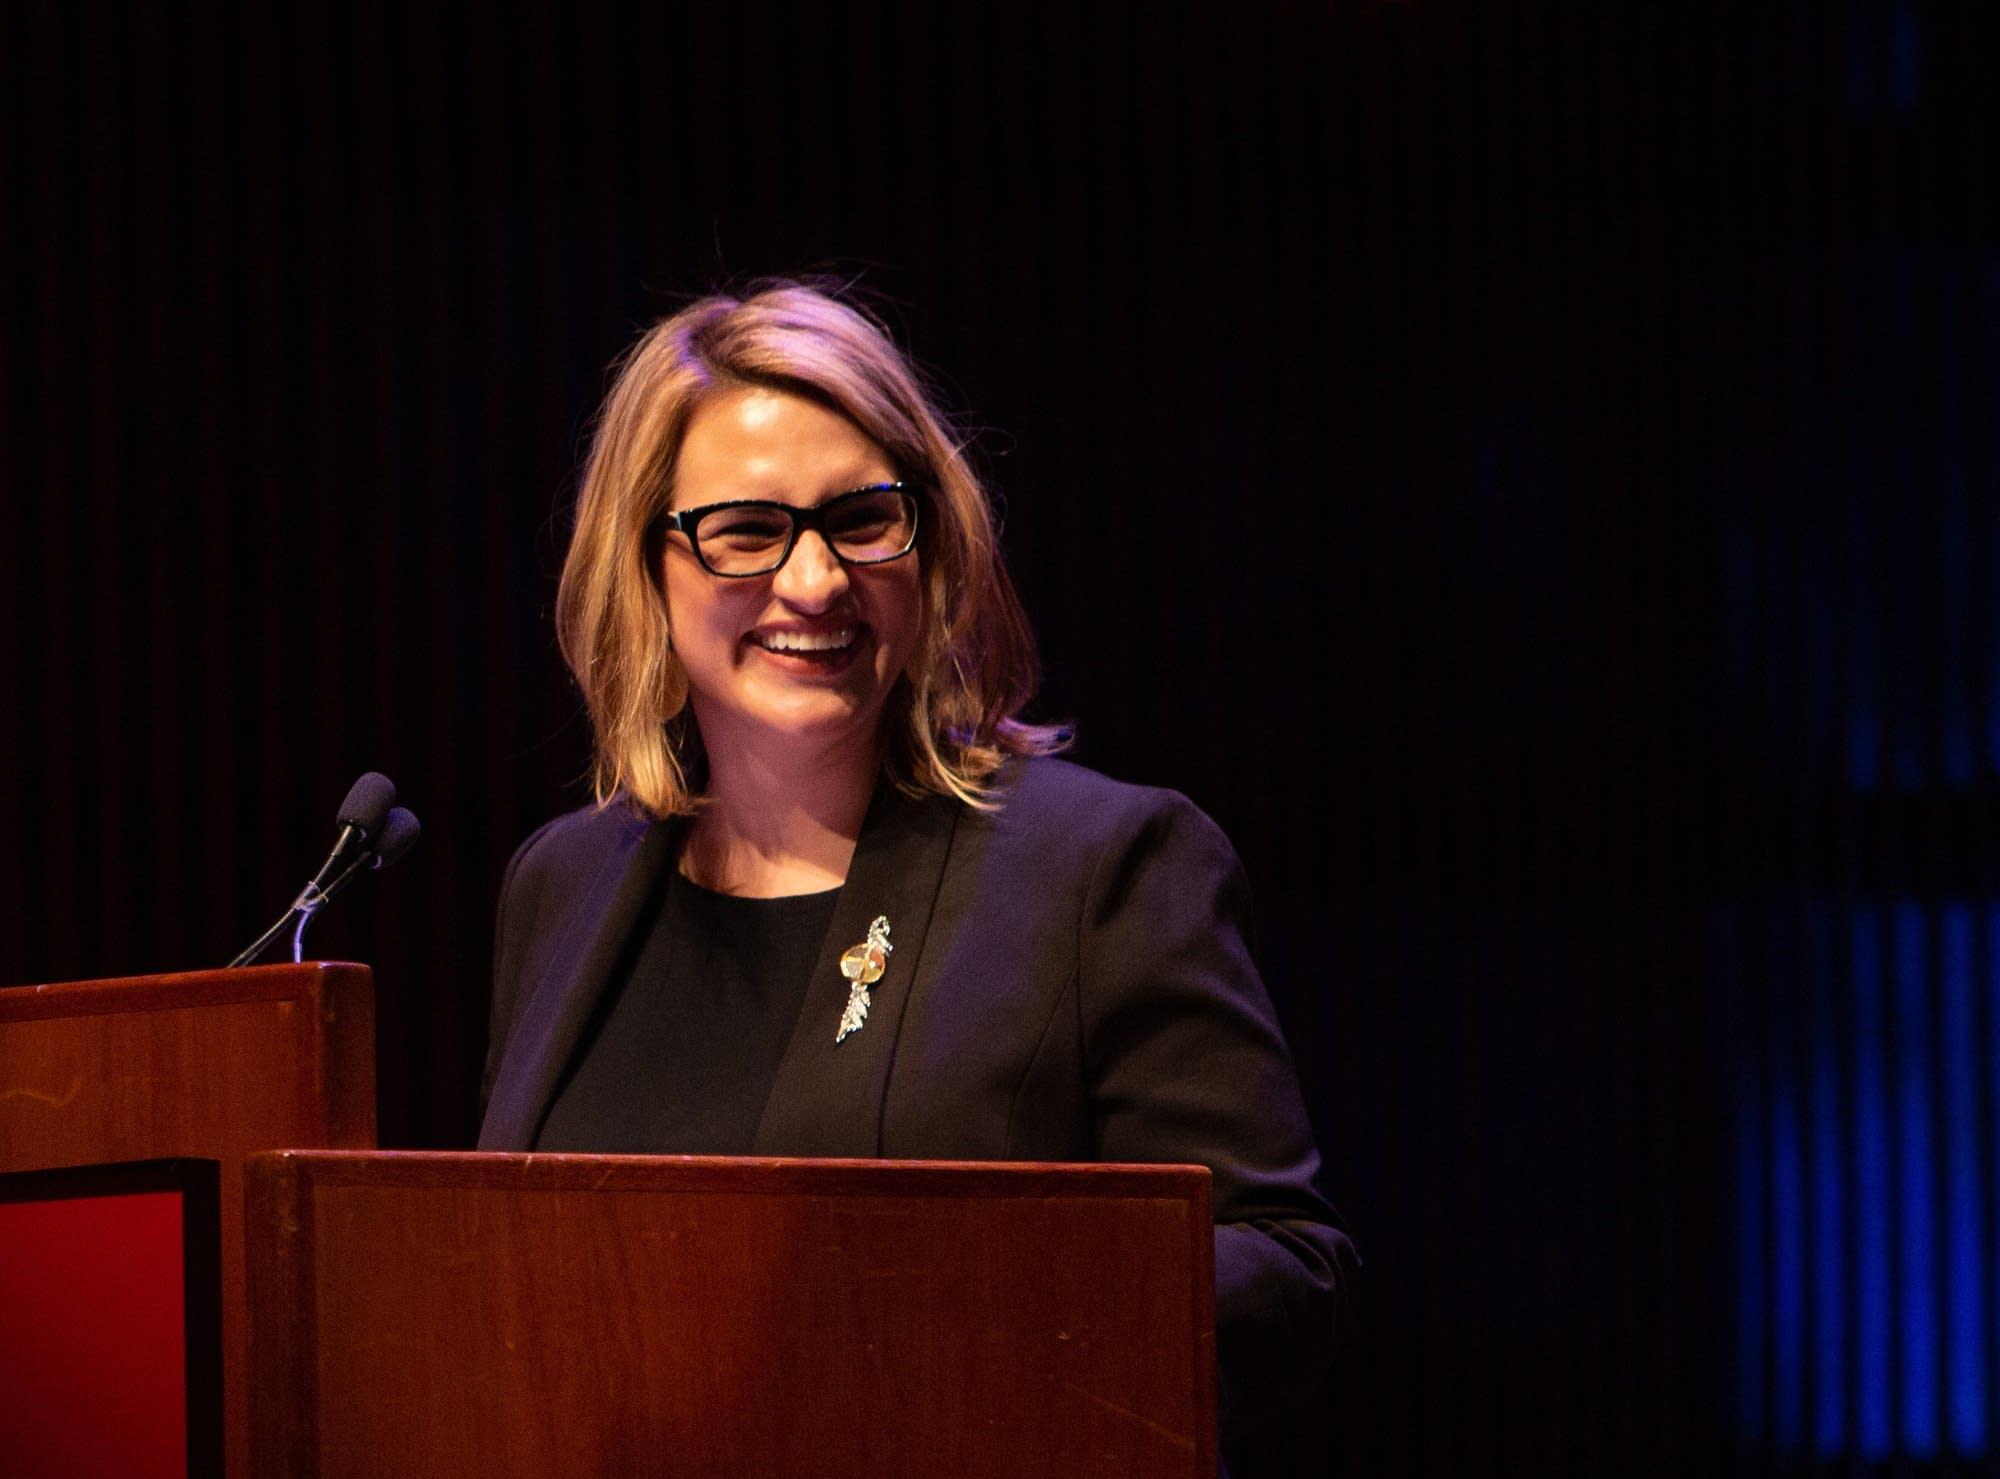 Lt. Gov. Peggy Flanagan speaks during the MLK Day event.